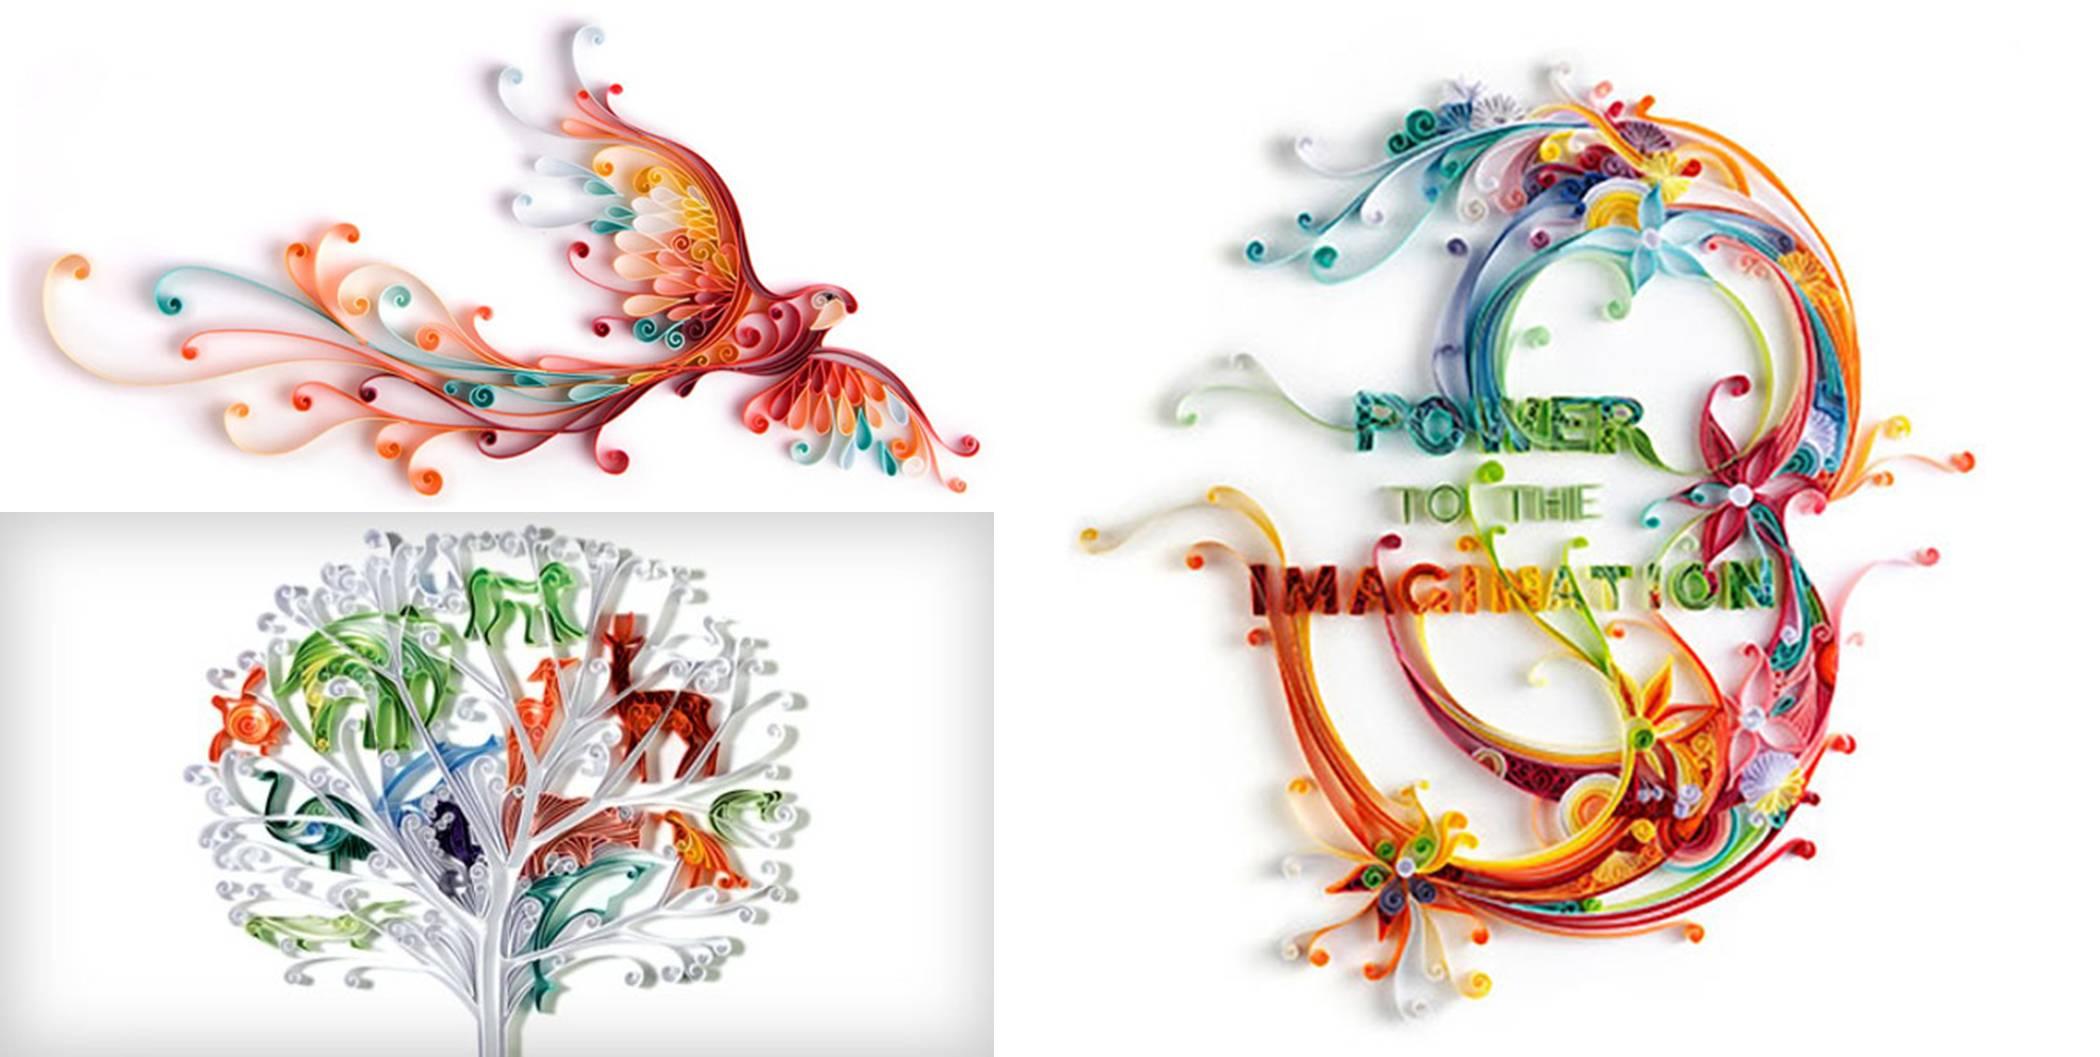 Paper craft dctdesigns creative canvas for Creative paper art